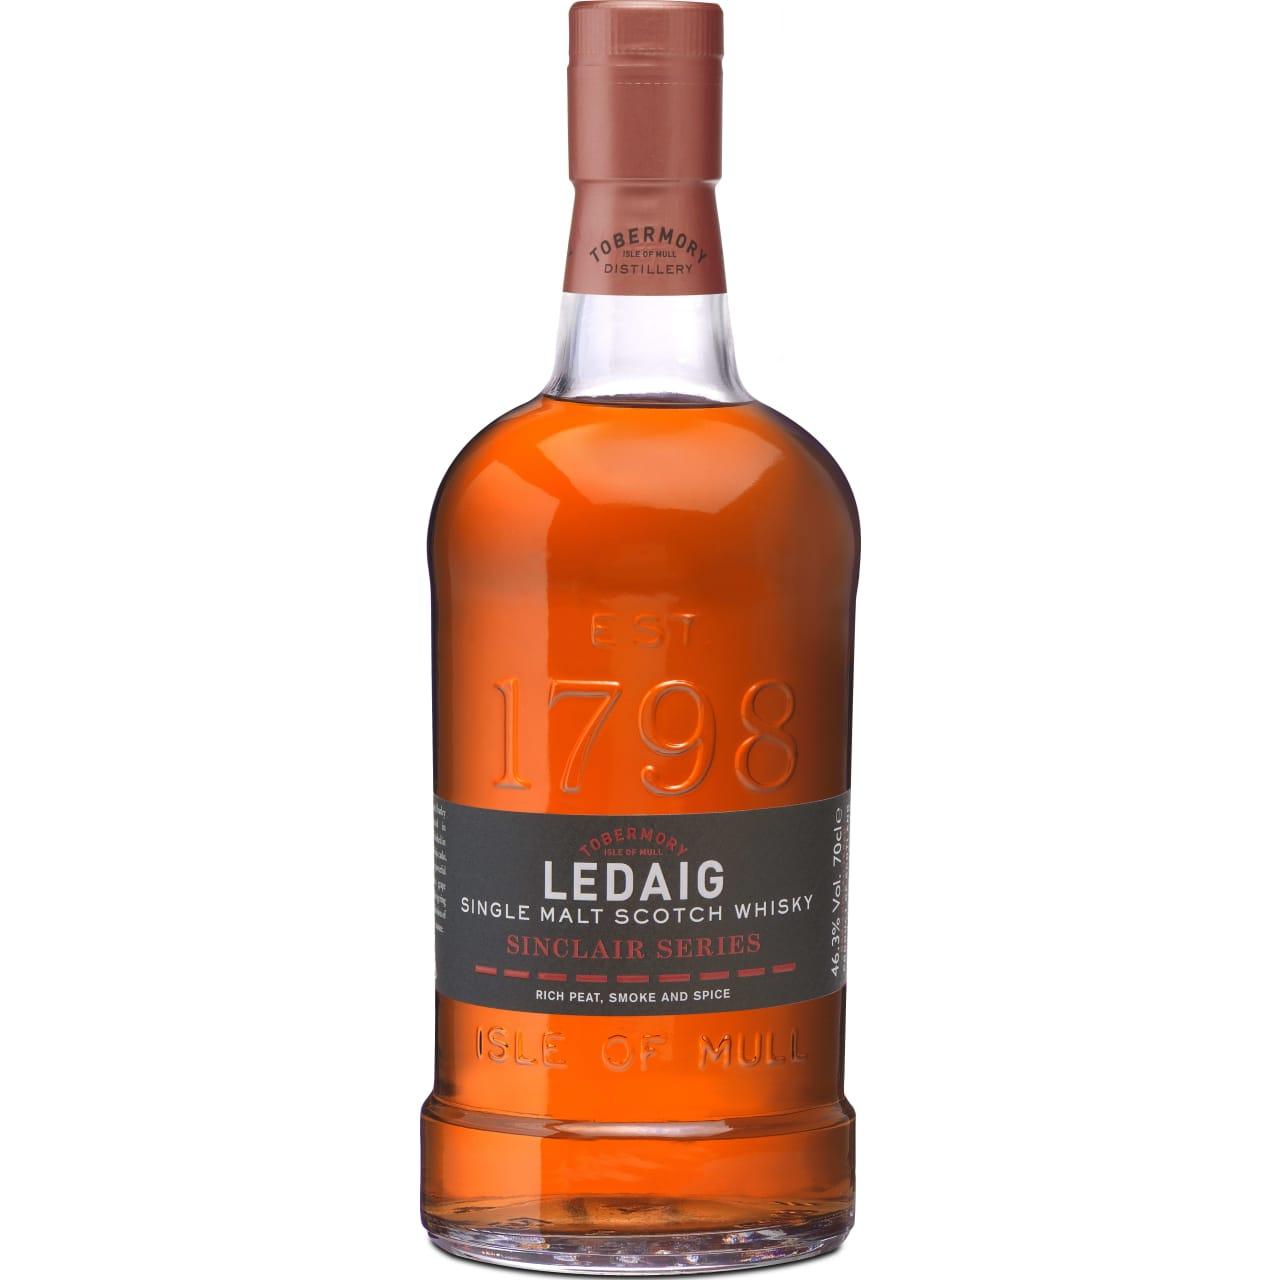 Product Image - Ledaig Singclair Series Rioja Finish Whisky